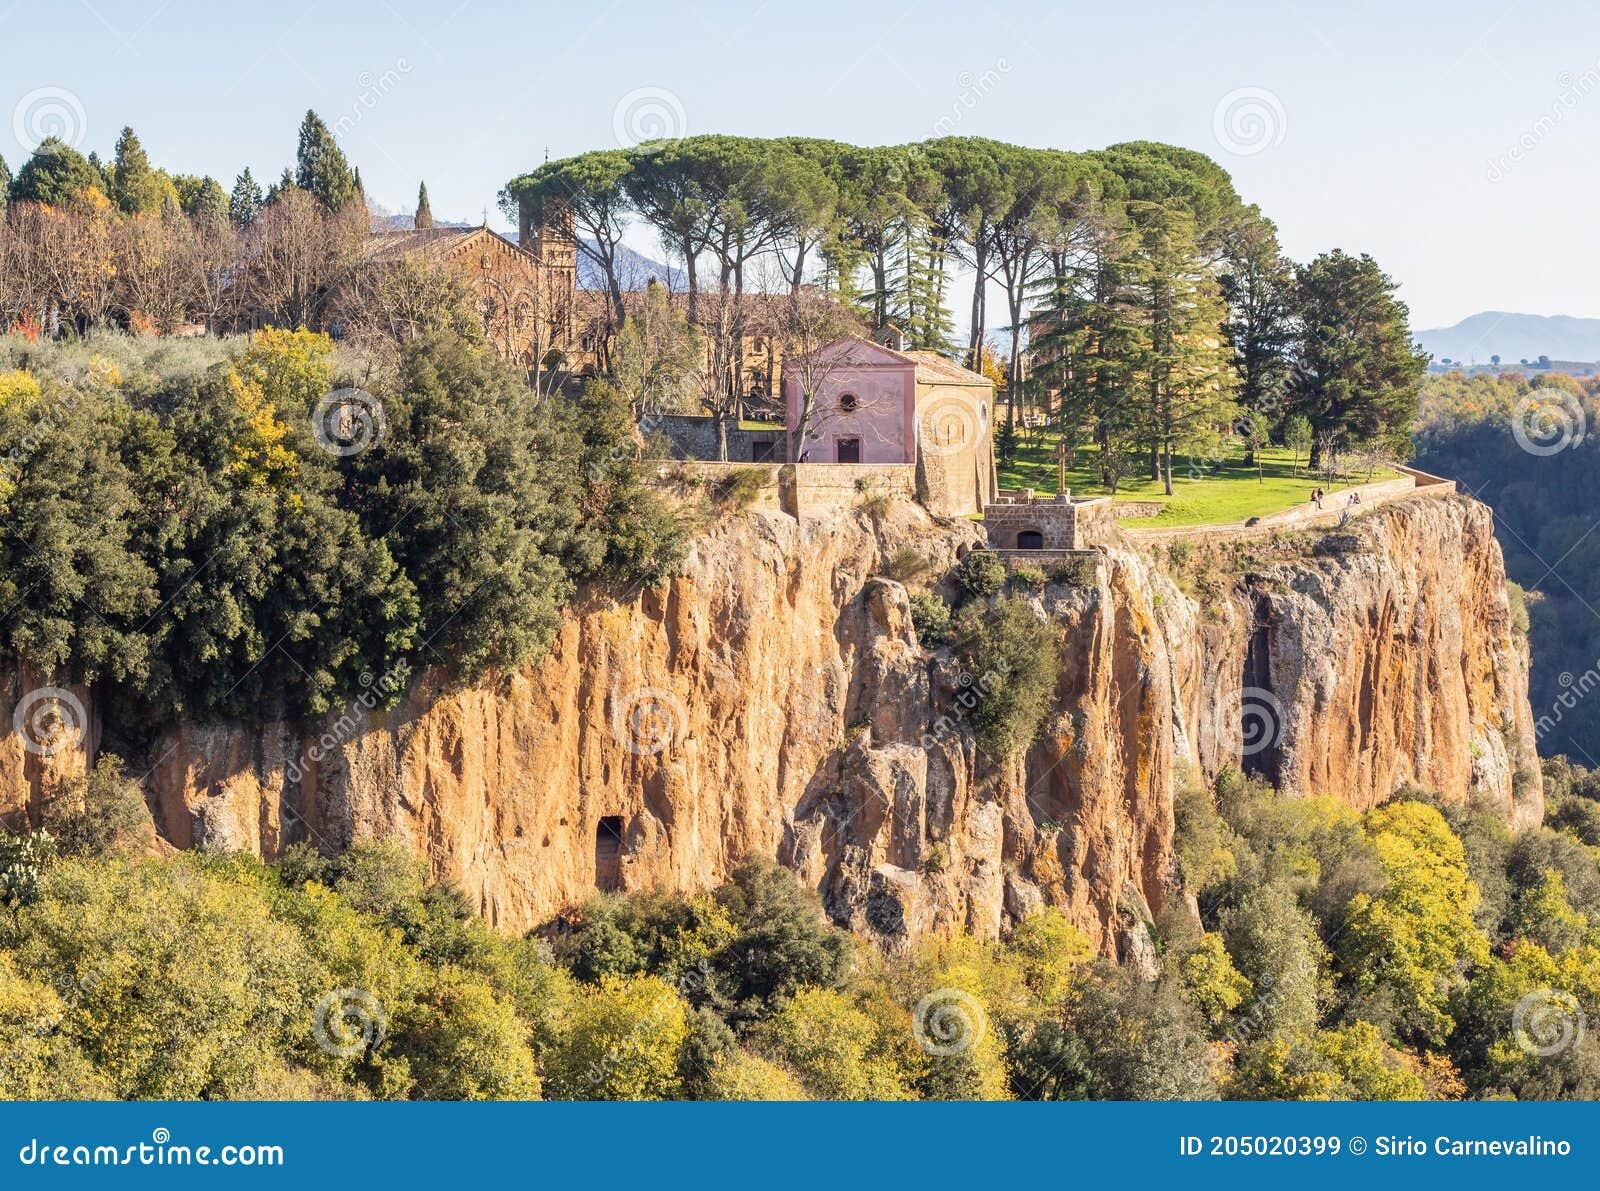 Castel Sant Elia Italia.The Wonderful Medieval Town Of Castel Sant Elia Italy Stock Image Image Of Civita Calcata 205020399